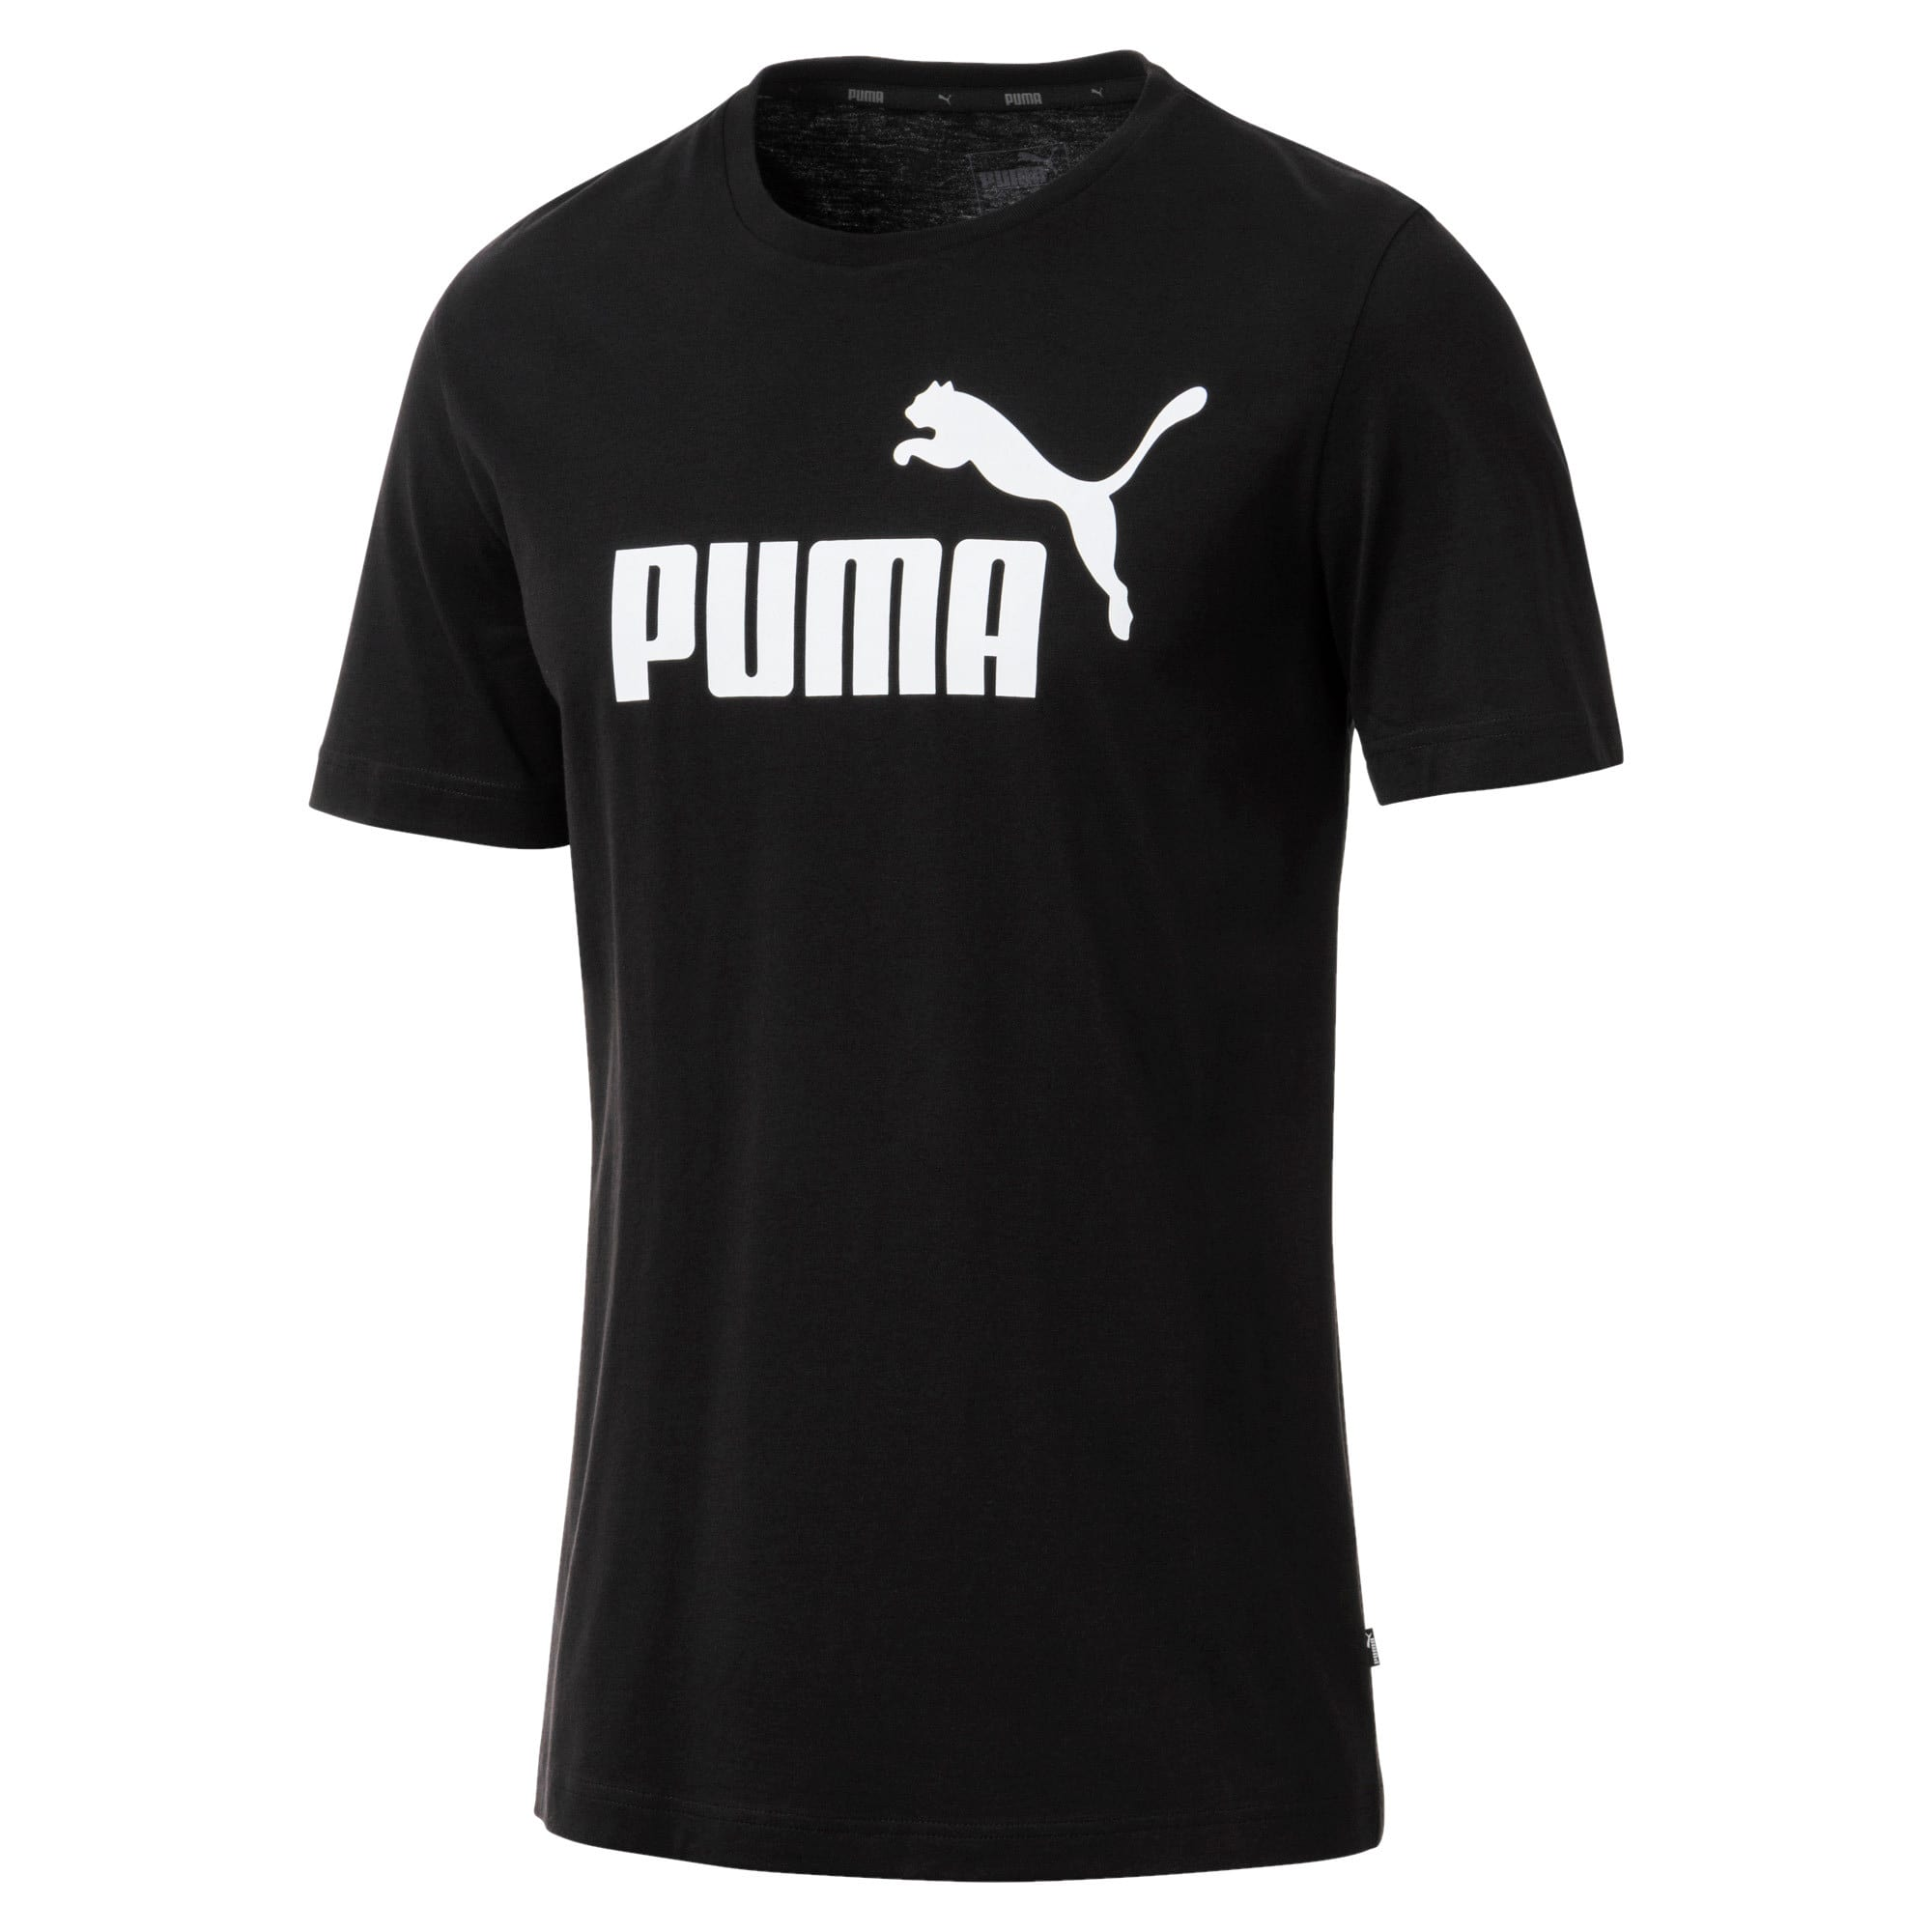 Thumbnail 1 of T-shirt a maniche corte Essentials uomo, Cotton Black, medium